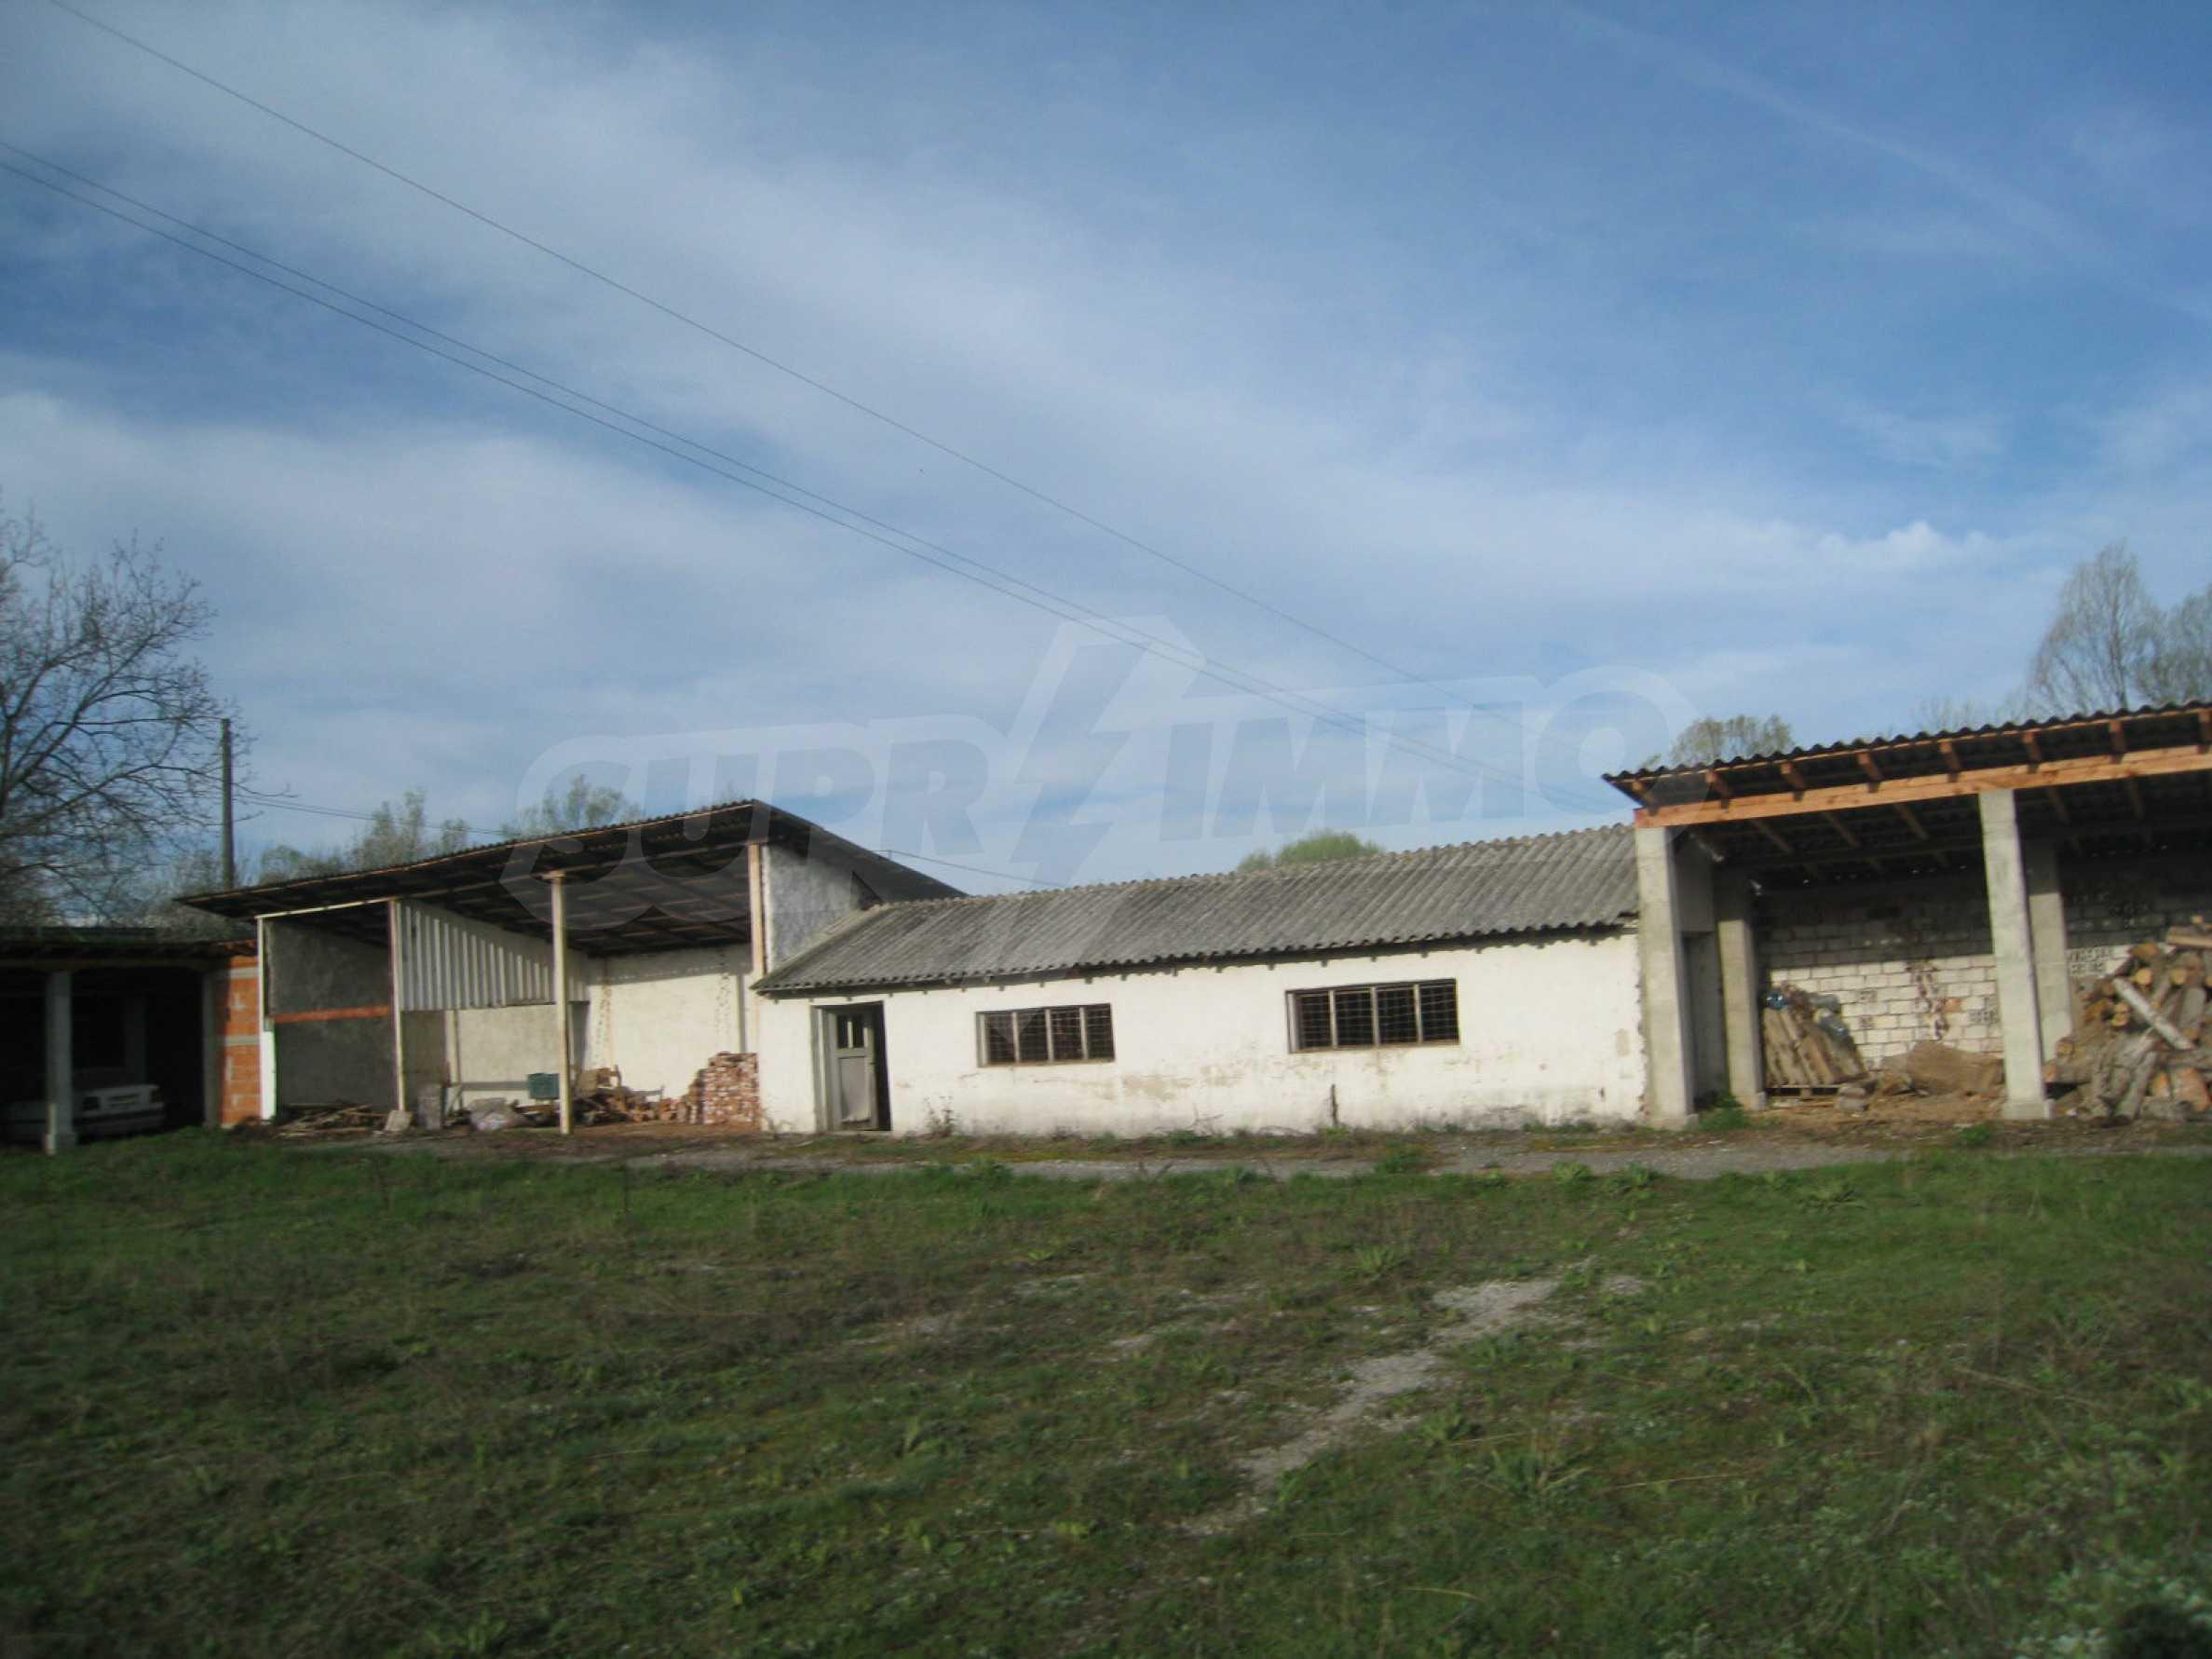 Fishpond, warehouses, residential areas and asphalt ground near Montana 6